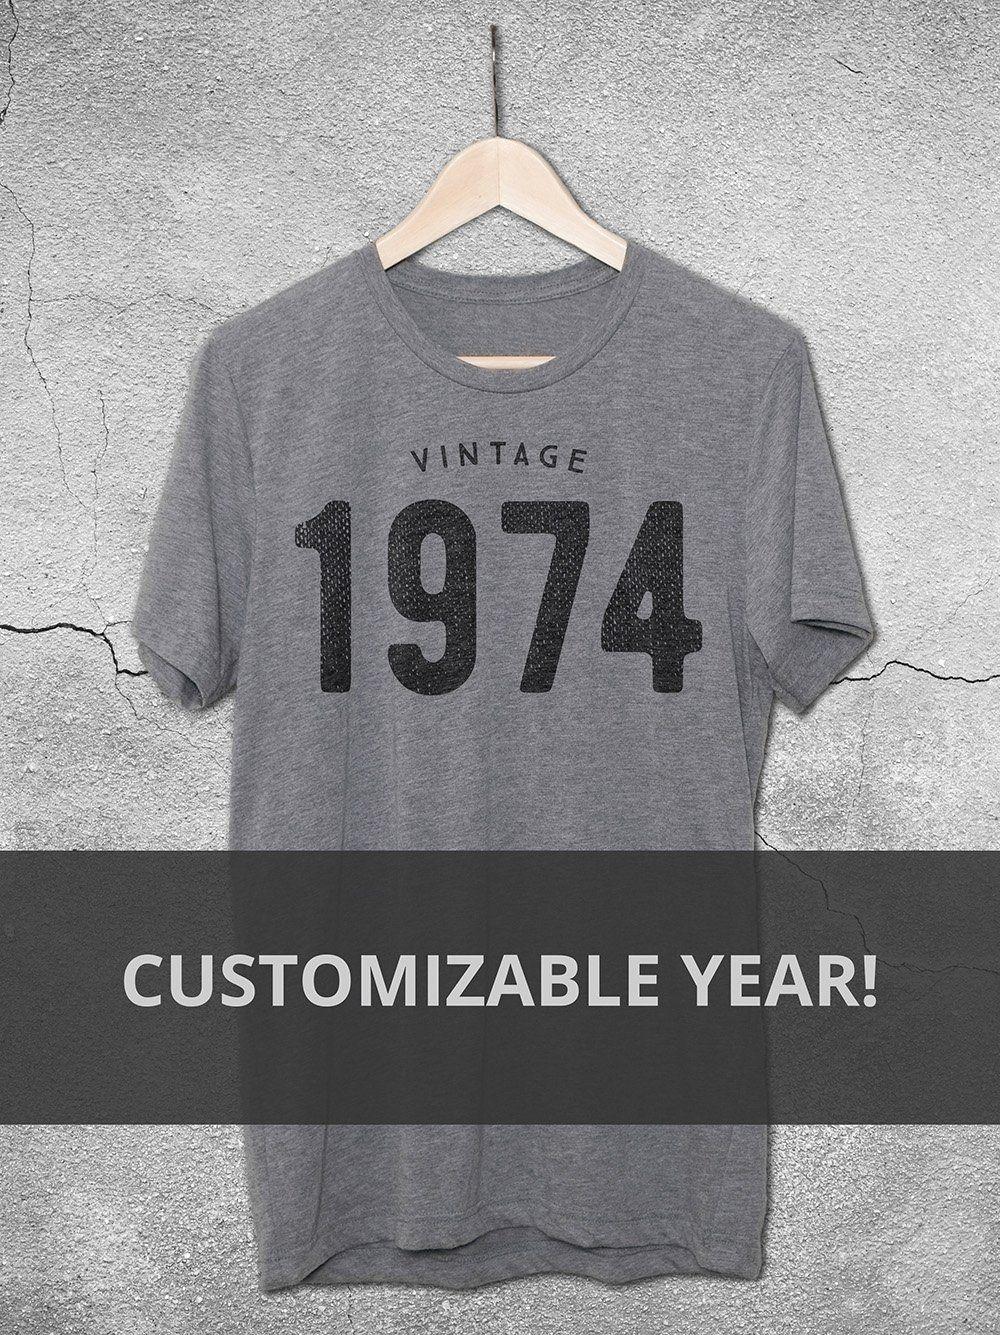 Customizable Vintage Year T Shirt